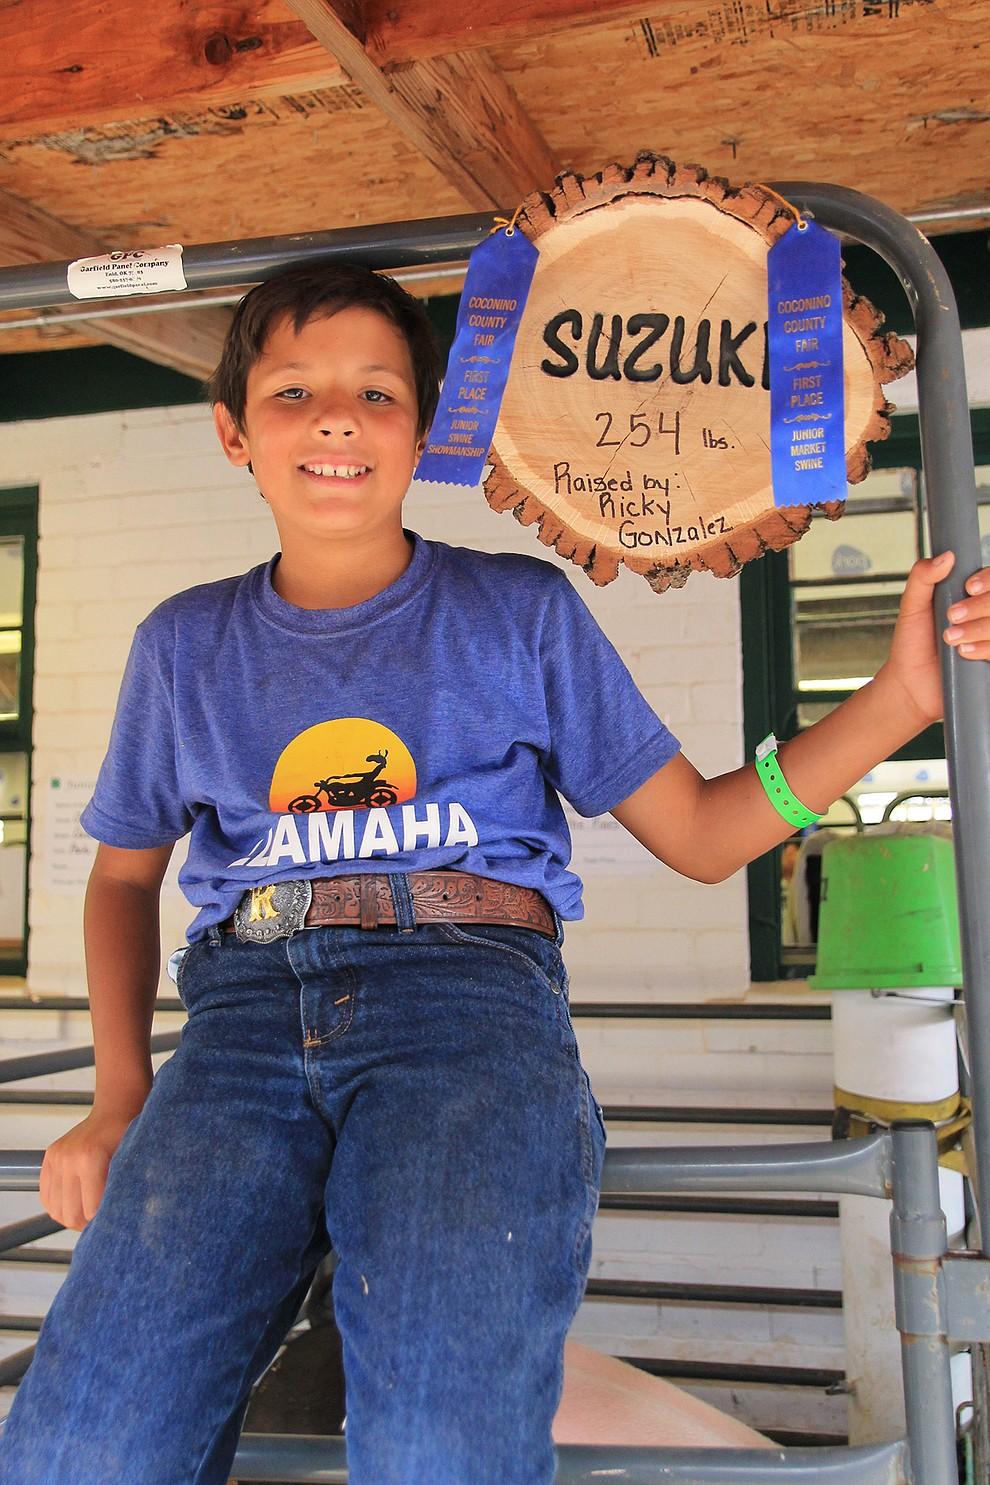 Ricky Gonzalez was a swine and poultry blue ribbon winner. (Wendy Howell/WGCN)